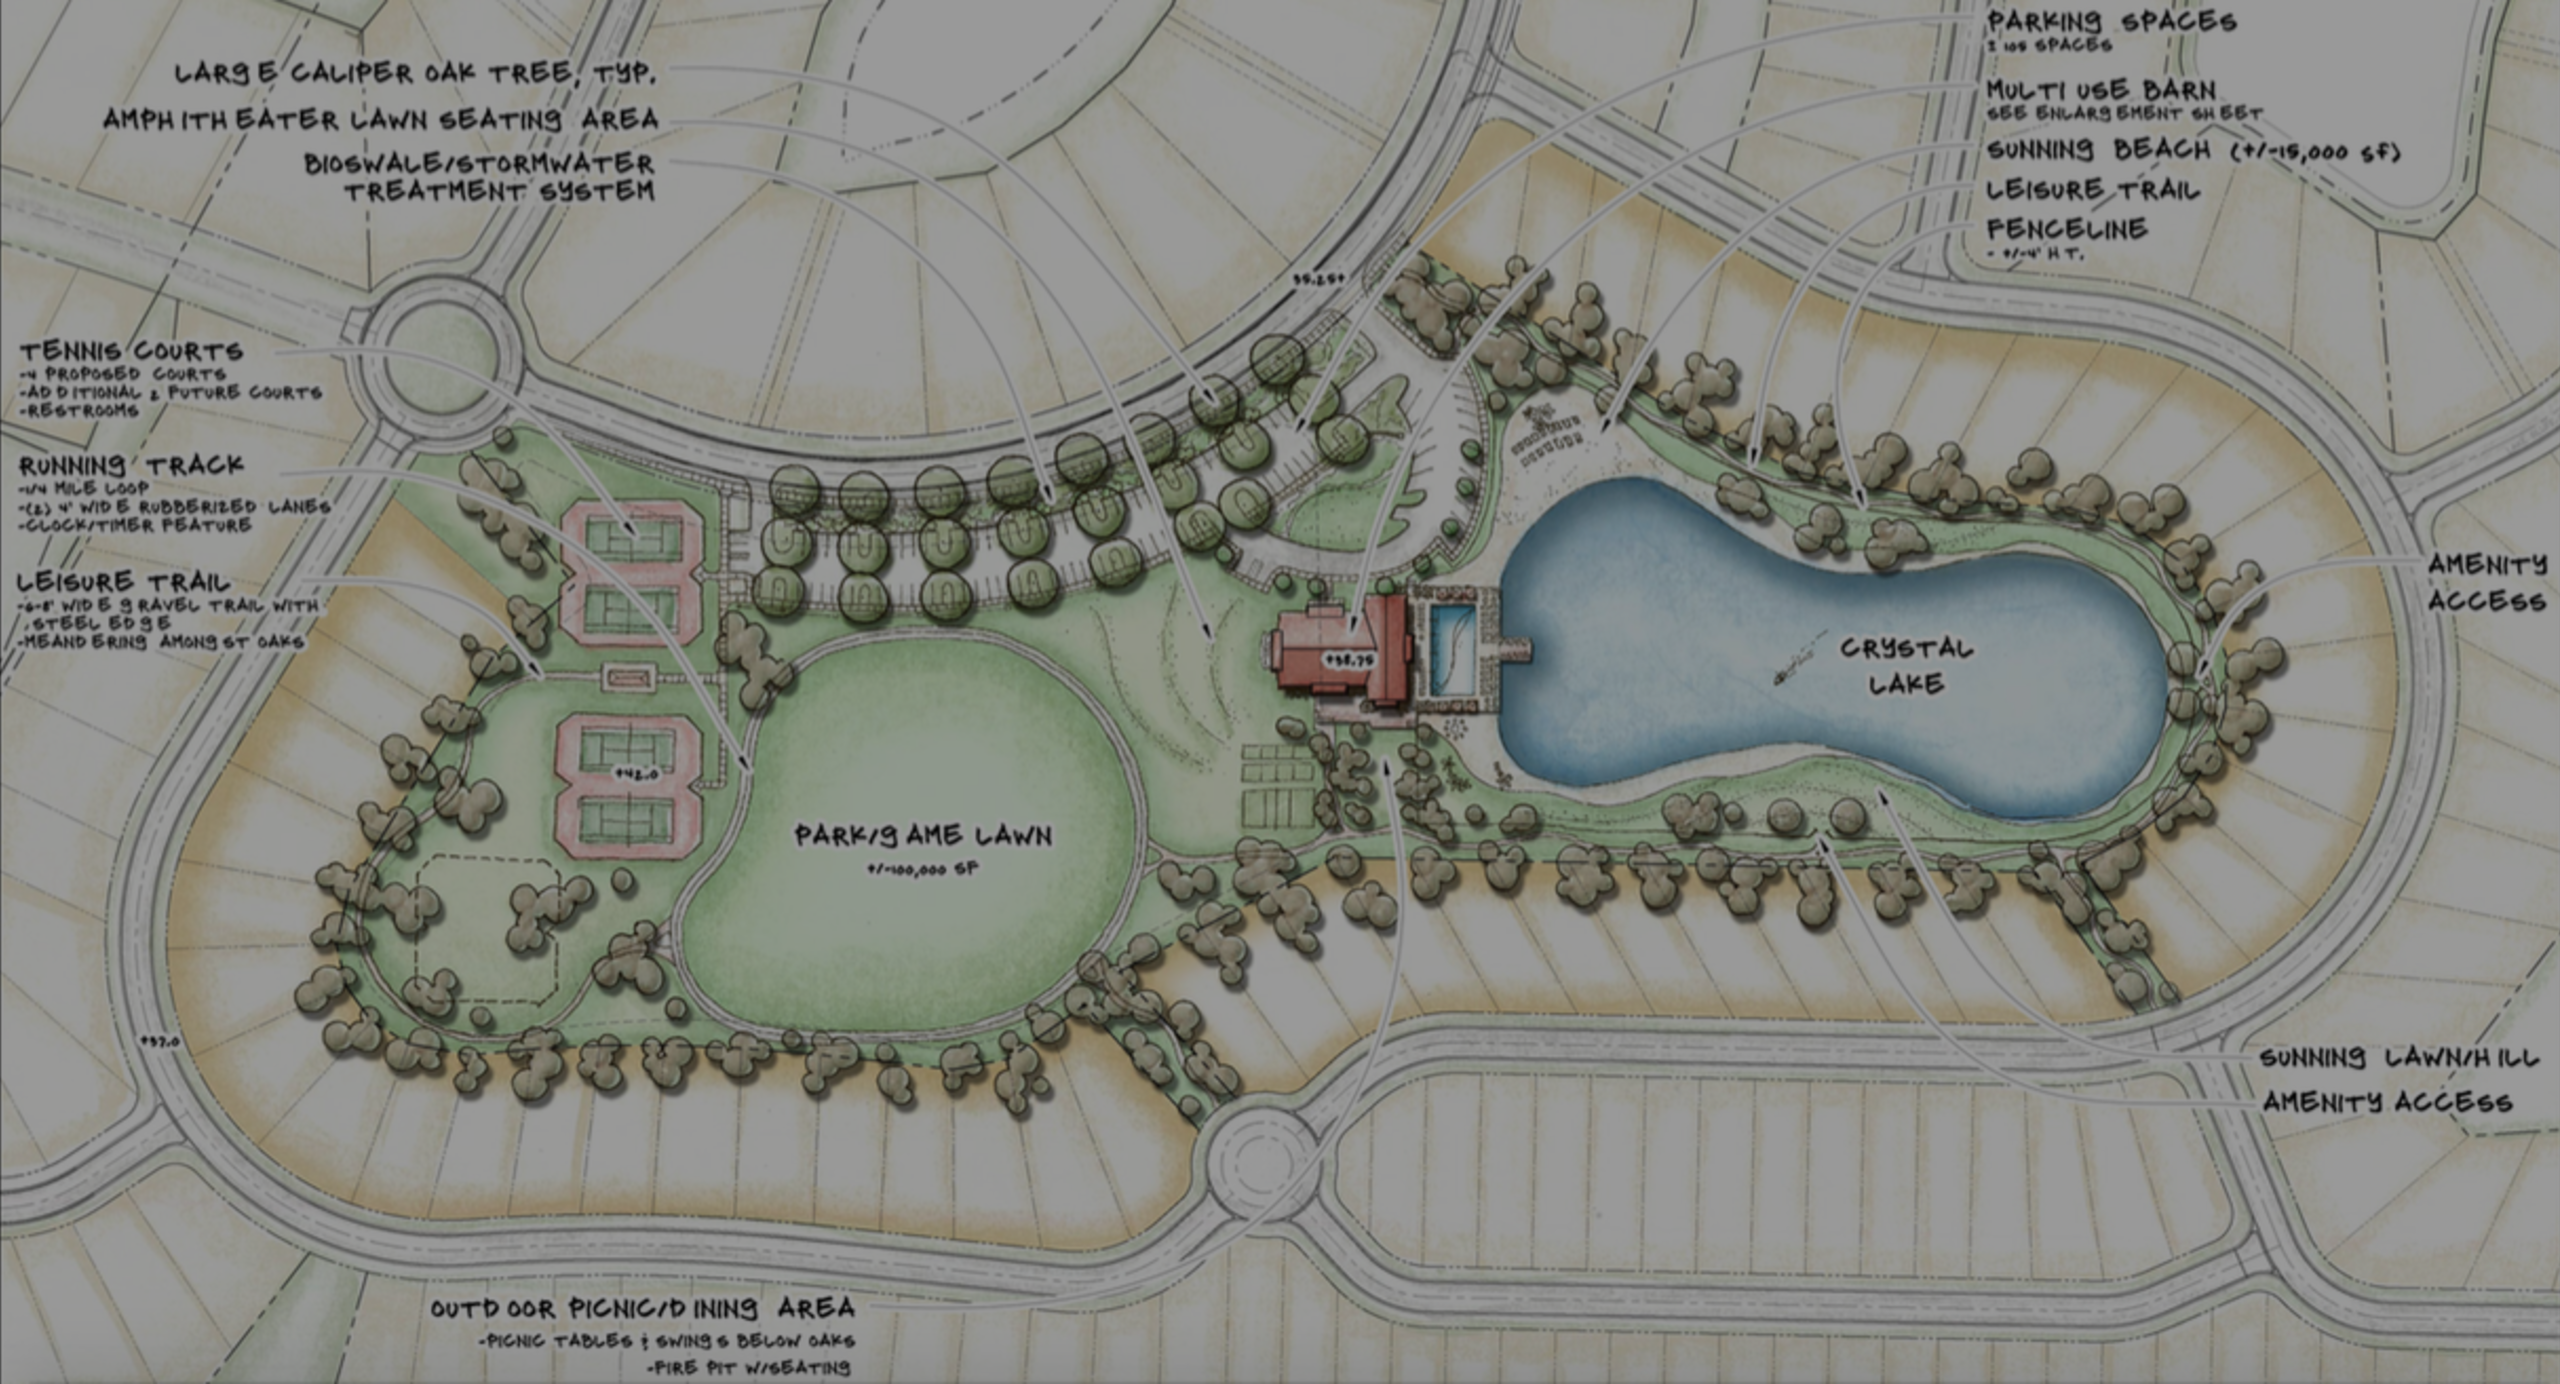 Hampton Lake New Construction Amenities Revealed